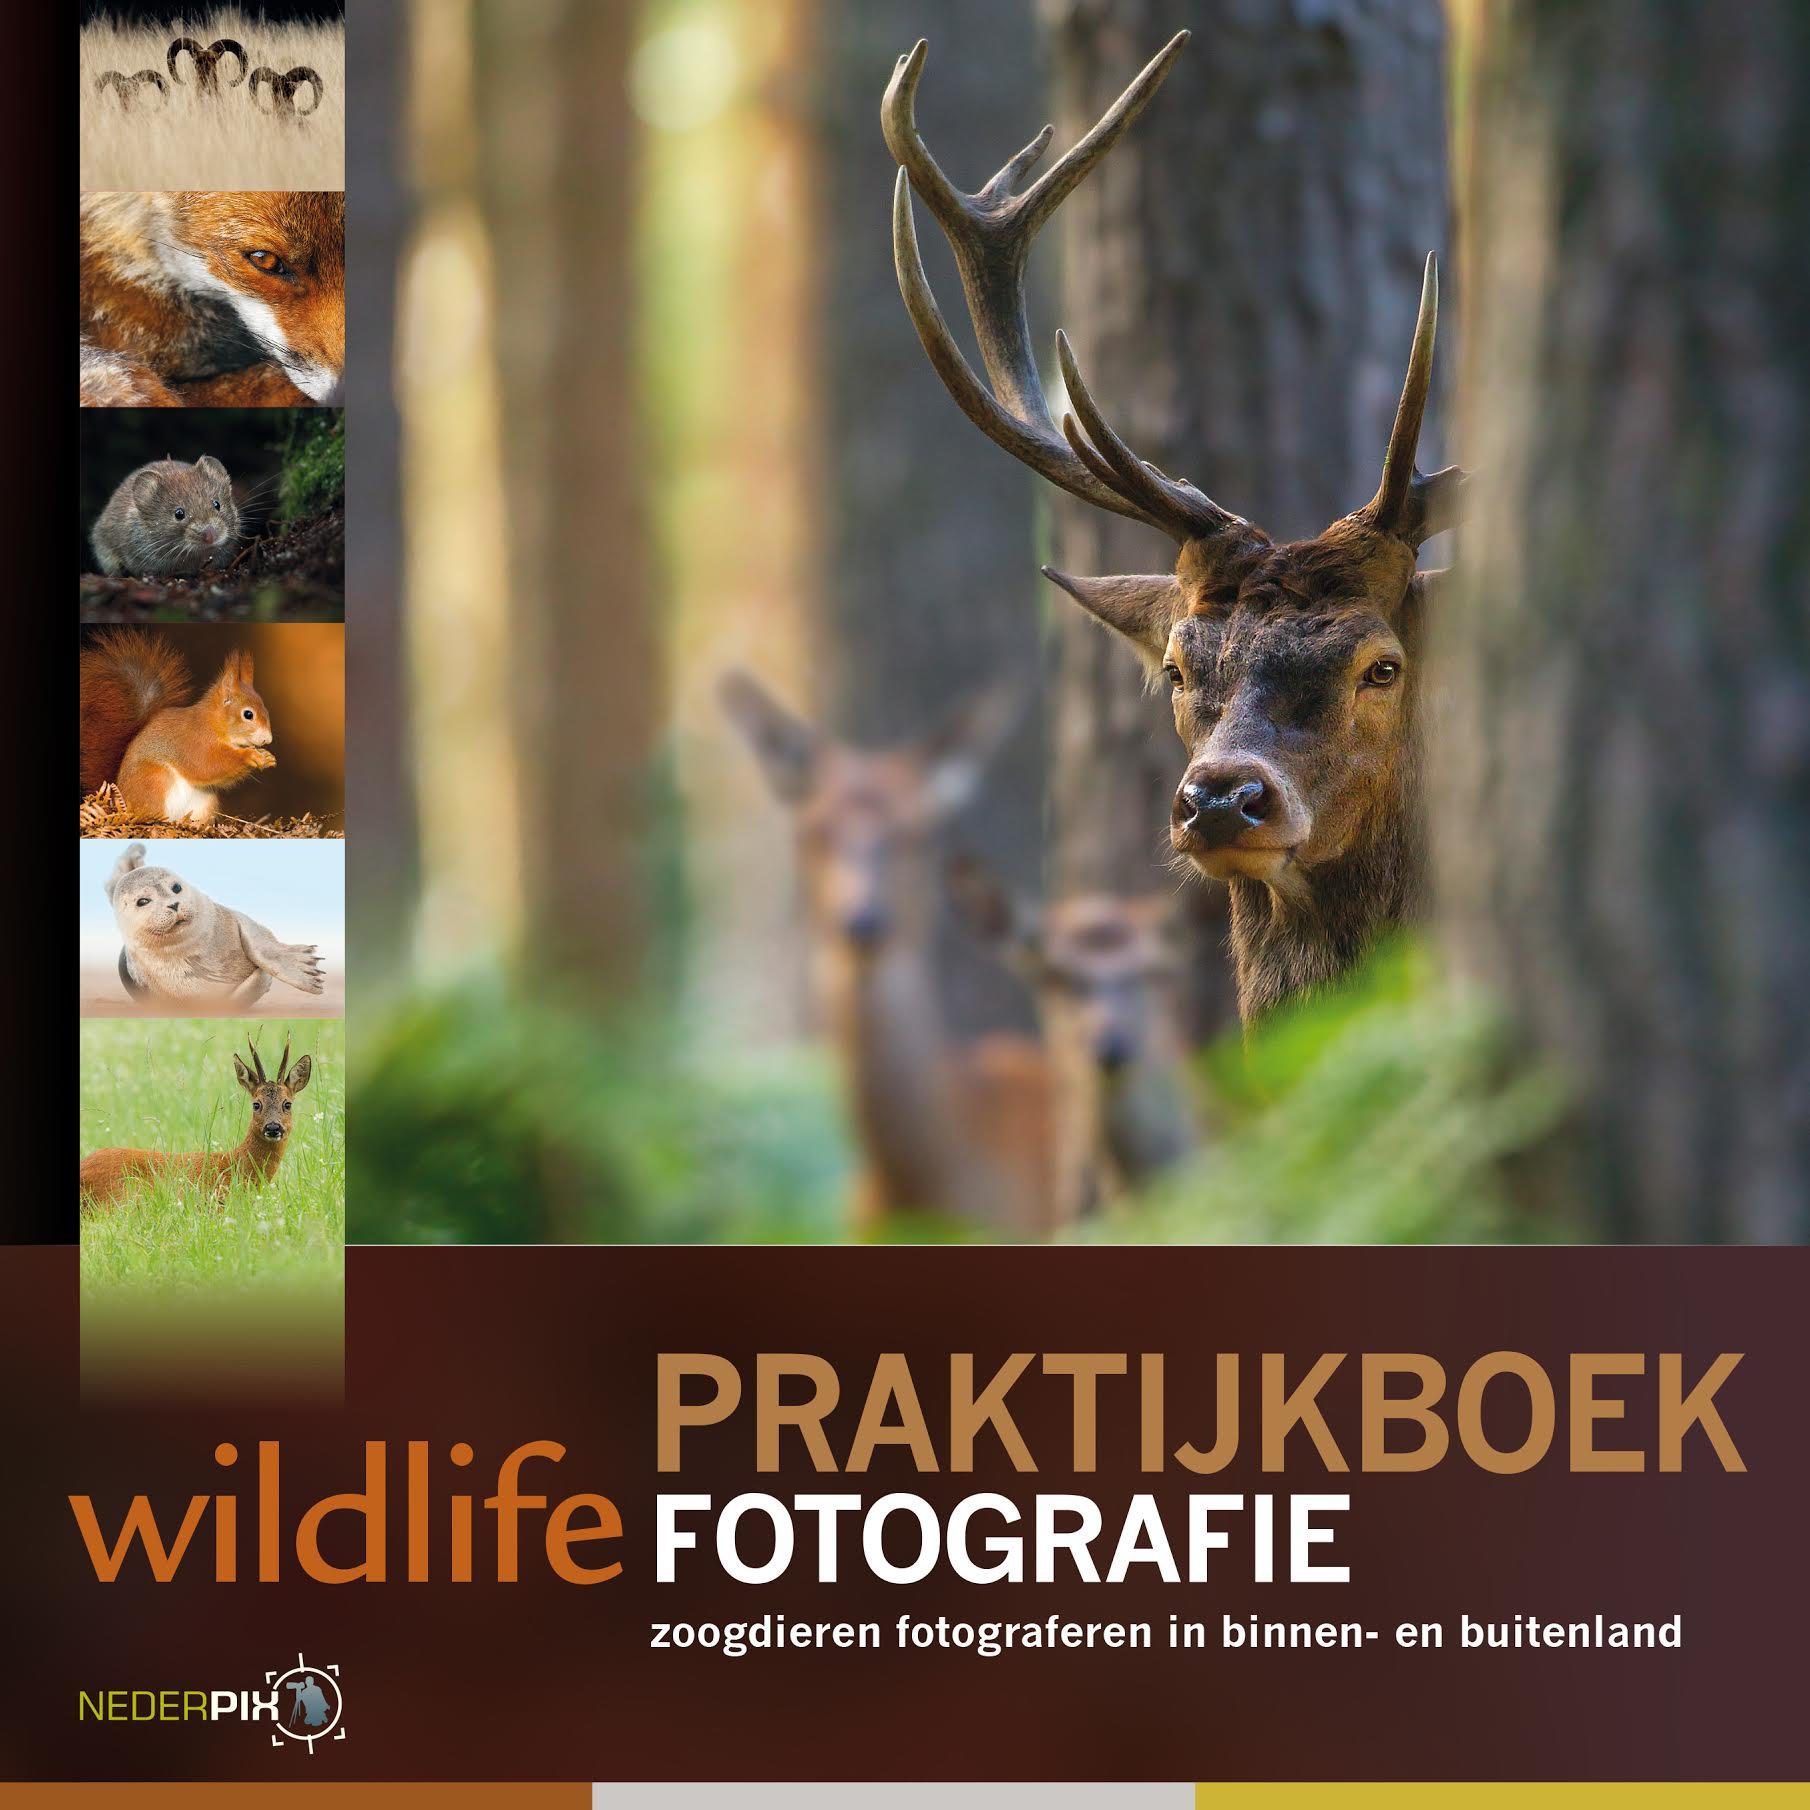 coverfoto van Praktijkboek Wildlifefotografie